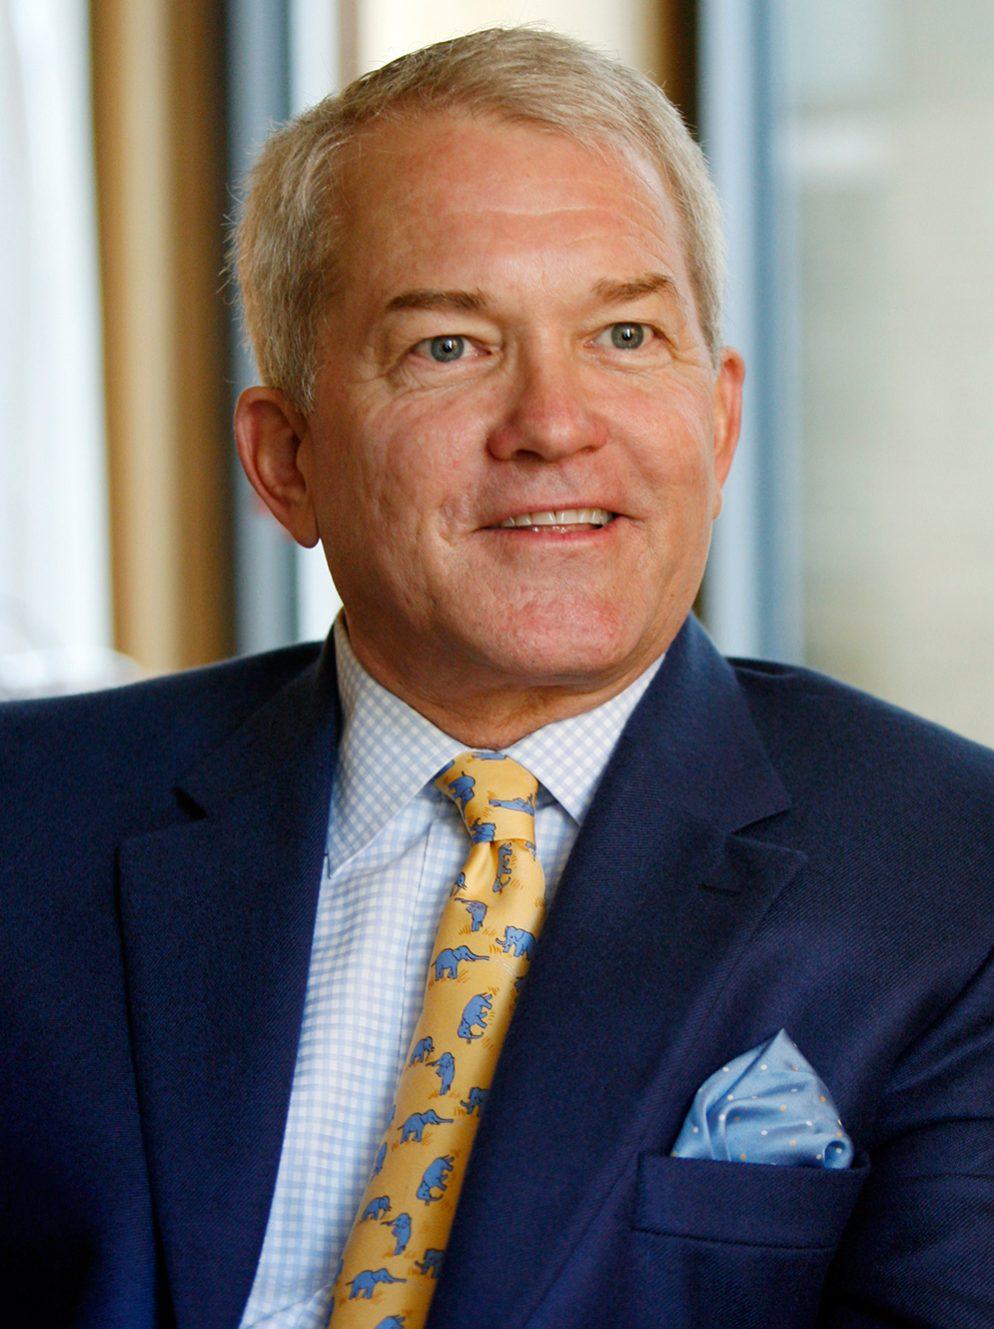 Mark Foley Has Been Lobbying for the Washington Nationals